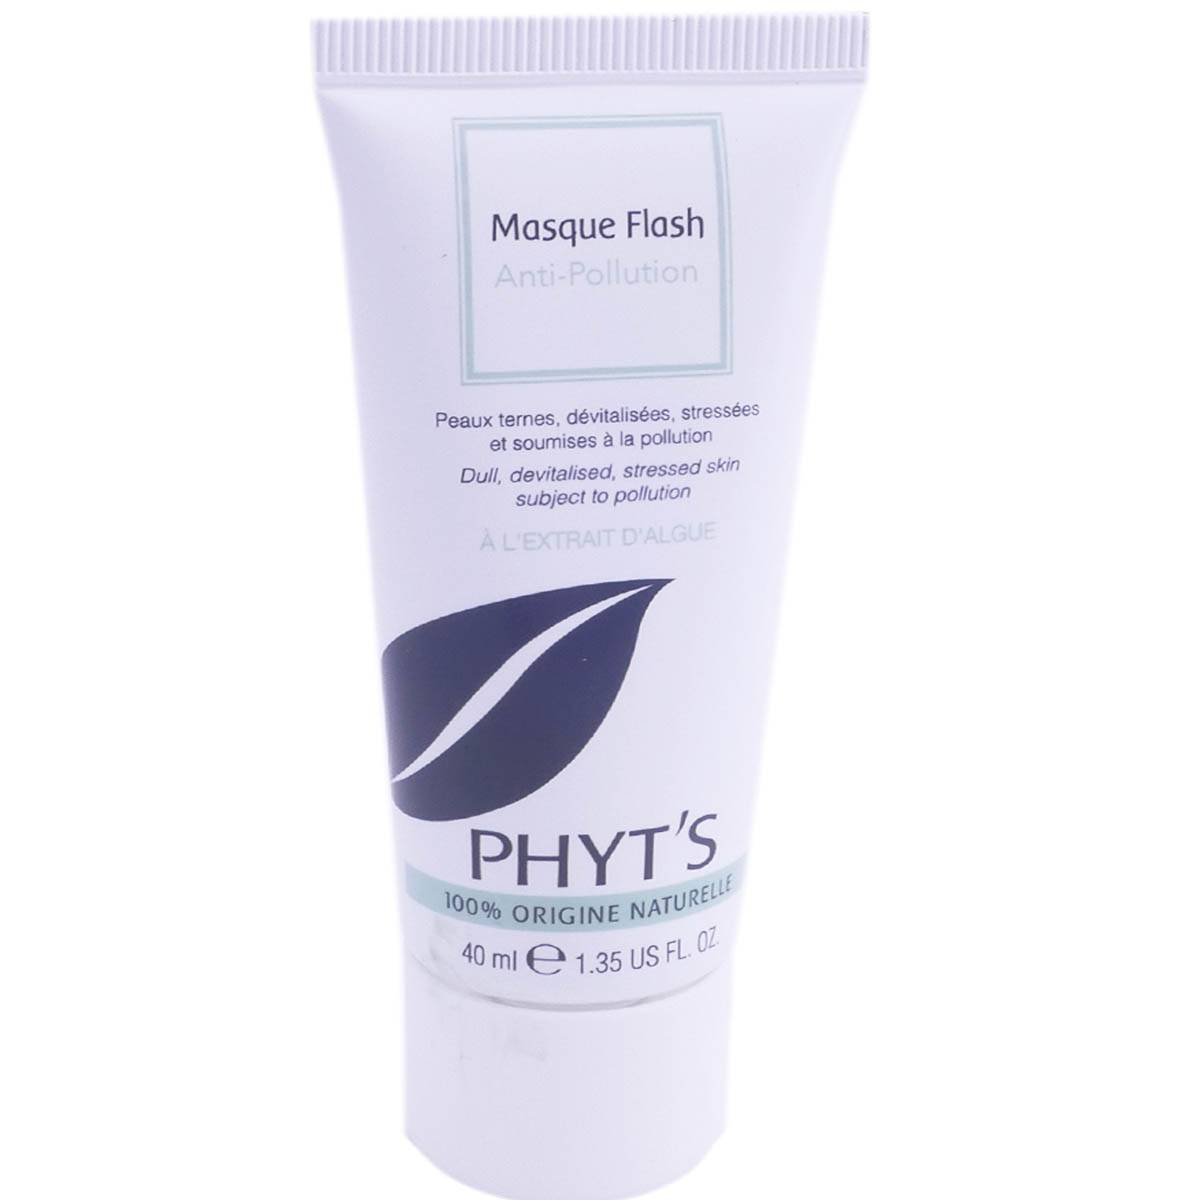 Phyt's masque flash anti-pollution peaux ternes 40ml